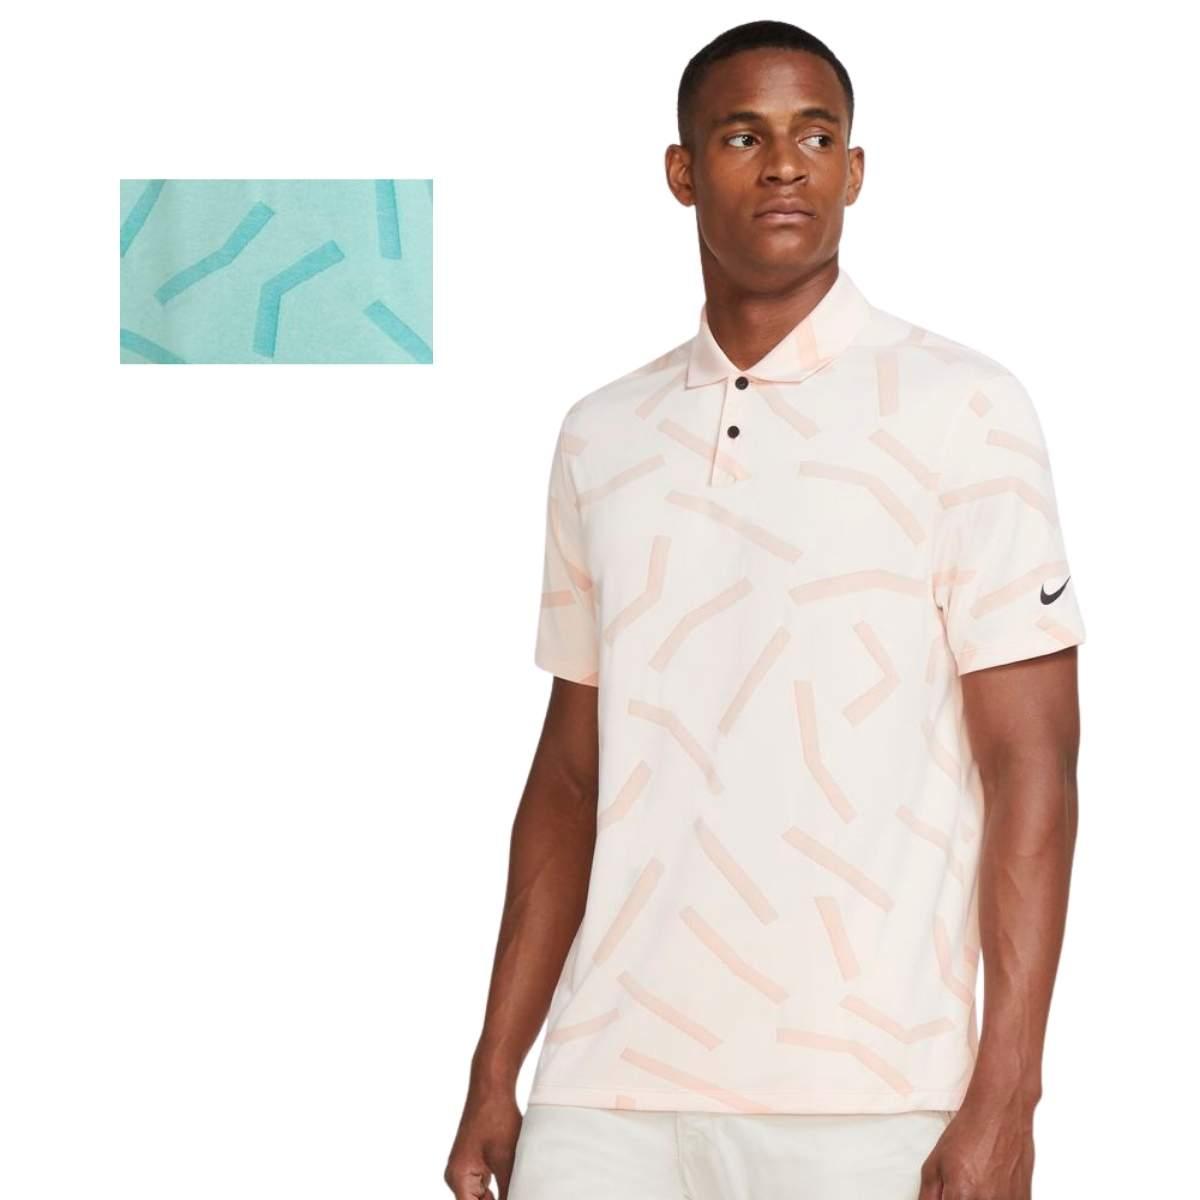 Nike Men's 2021 Dri-Fit Vapor Course Print Golf Polo